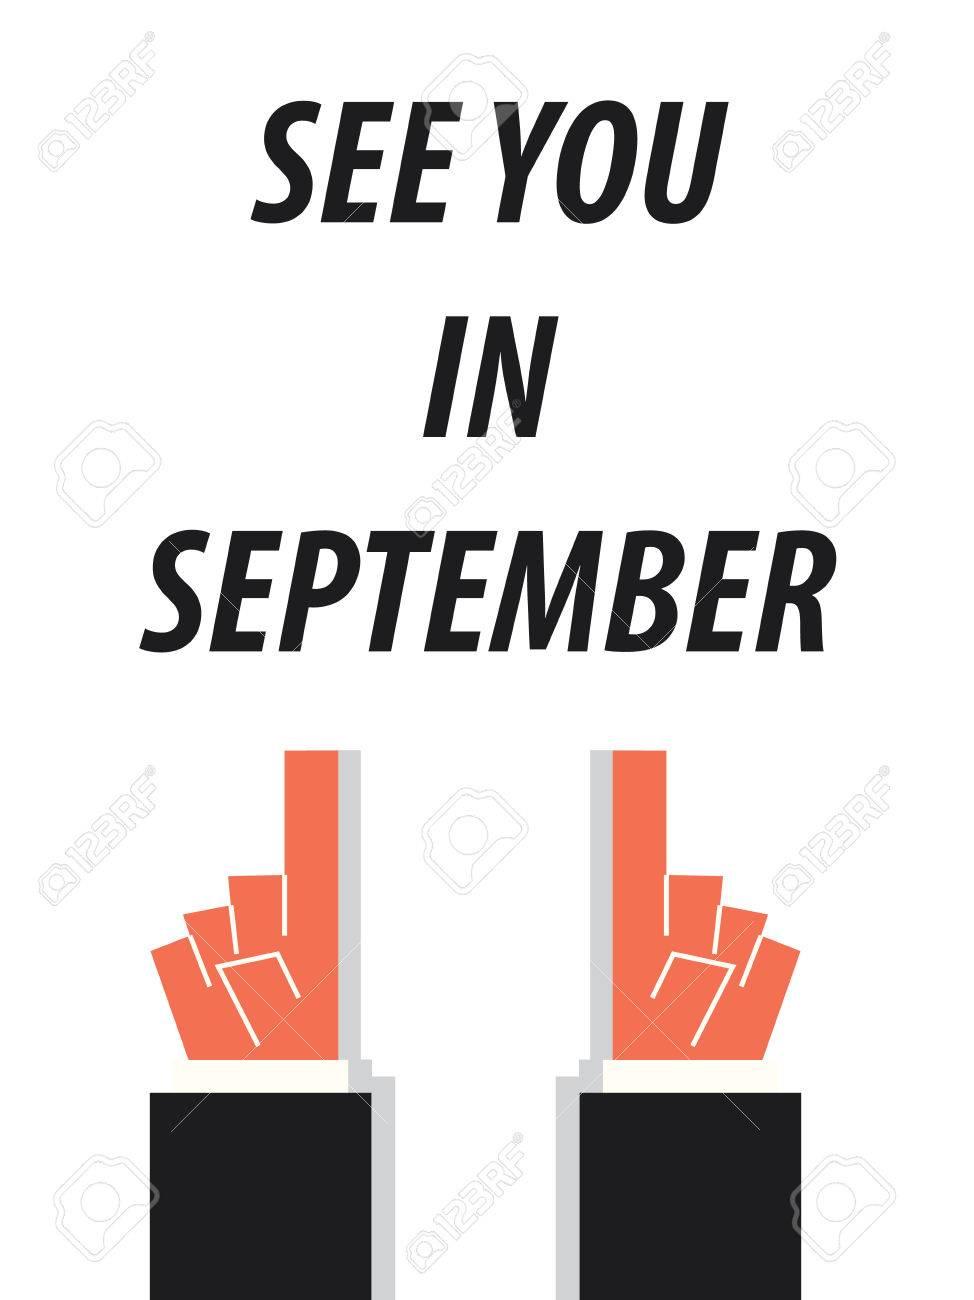 See You in September Lyrics